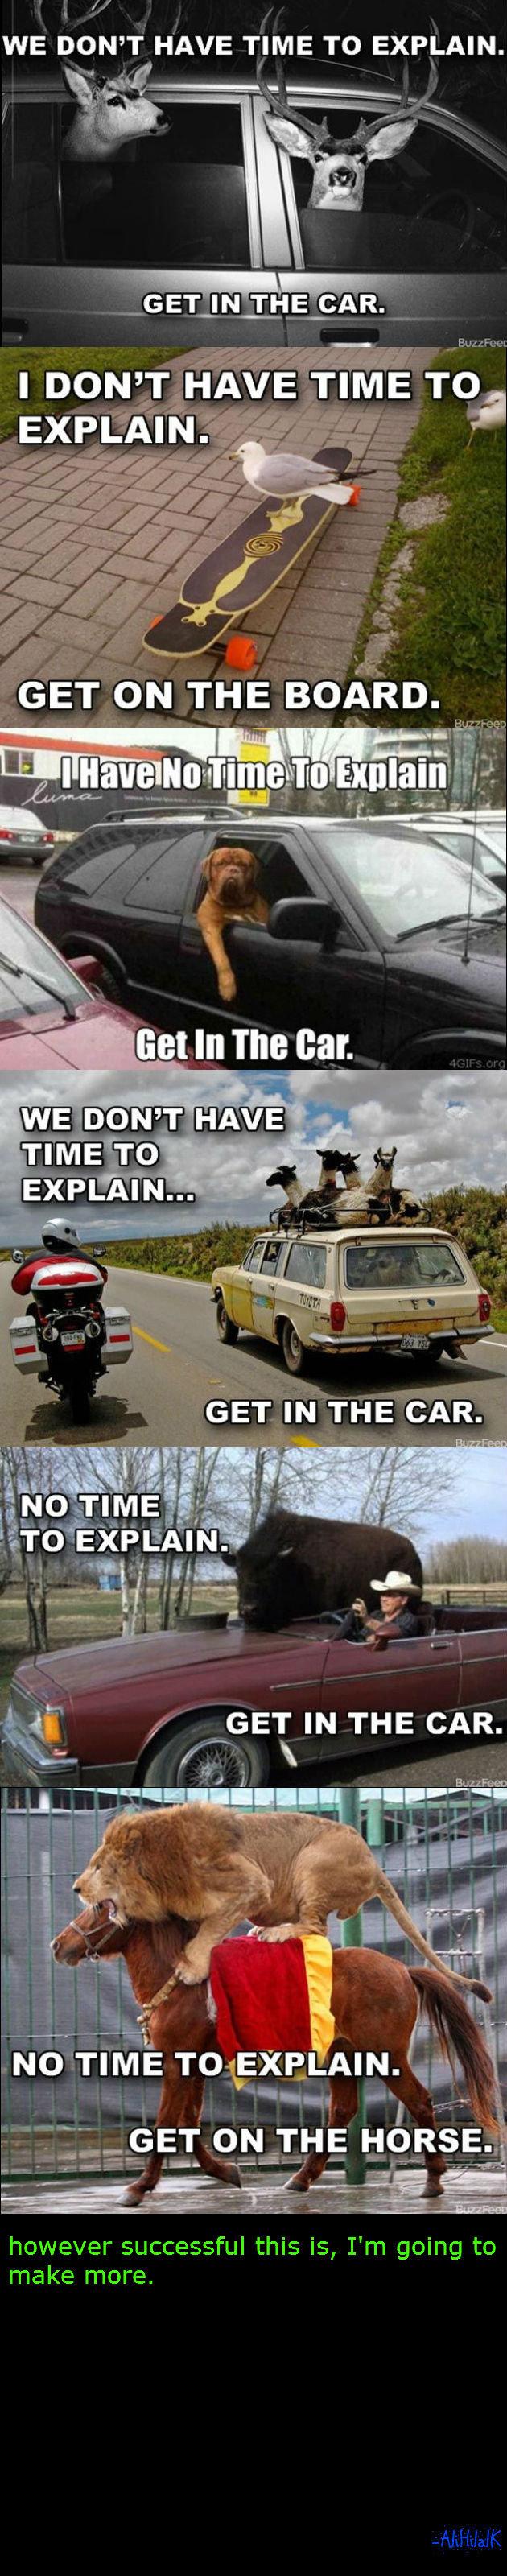 No Time To Explain. Part 3: www.funnyjunk.com/funny_pictures/2592627/No+Time+To+Explain+THREE/ Part 2: www.funnyjunk.com/funny_pictures/2590088/No+Time+To+Expla